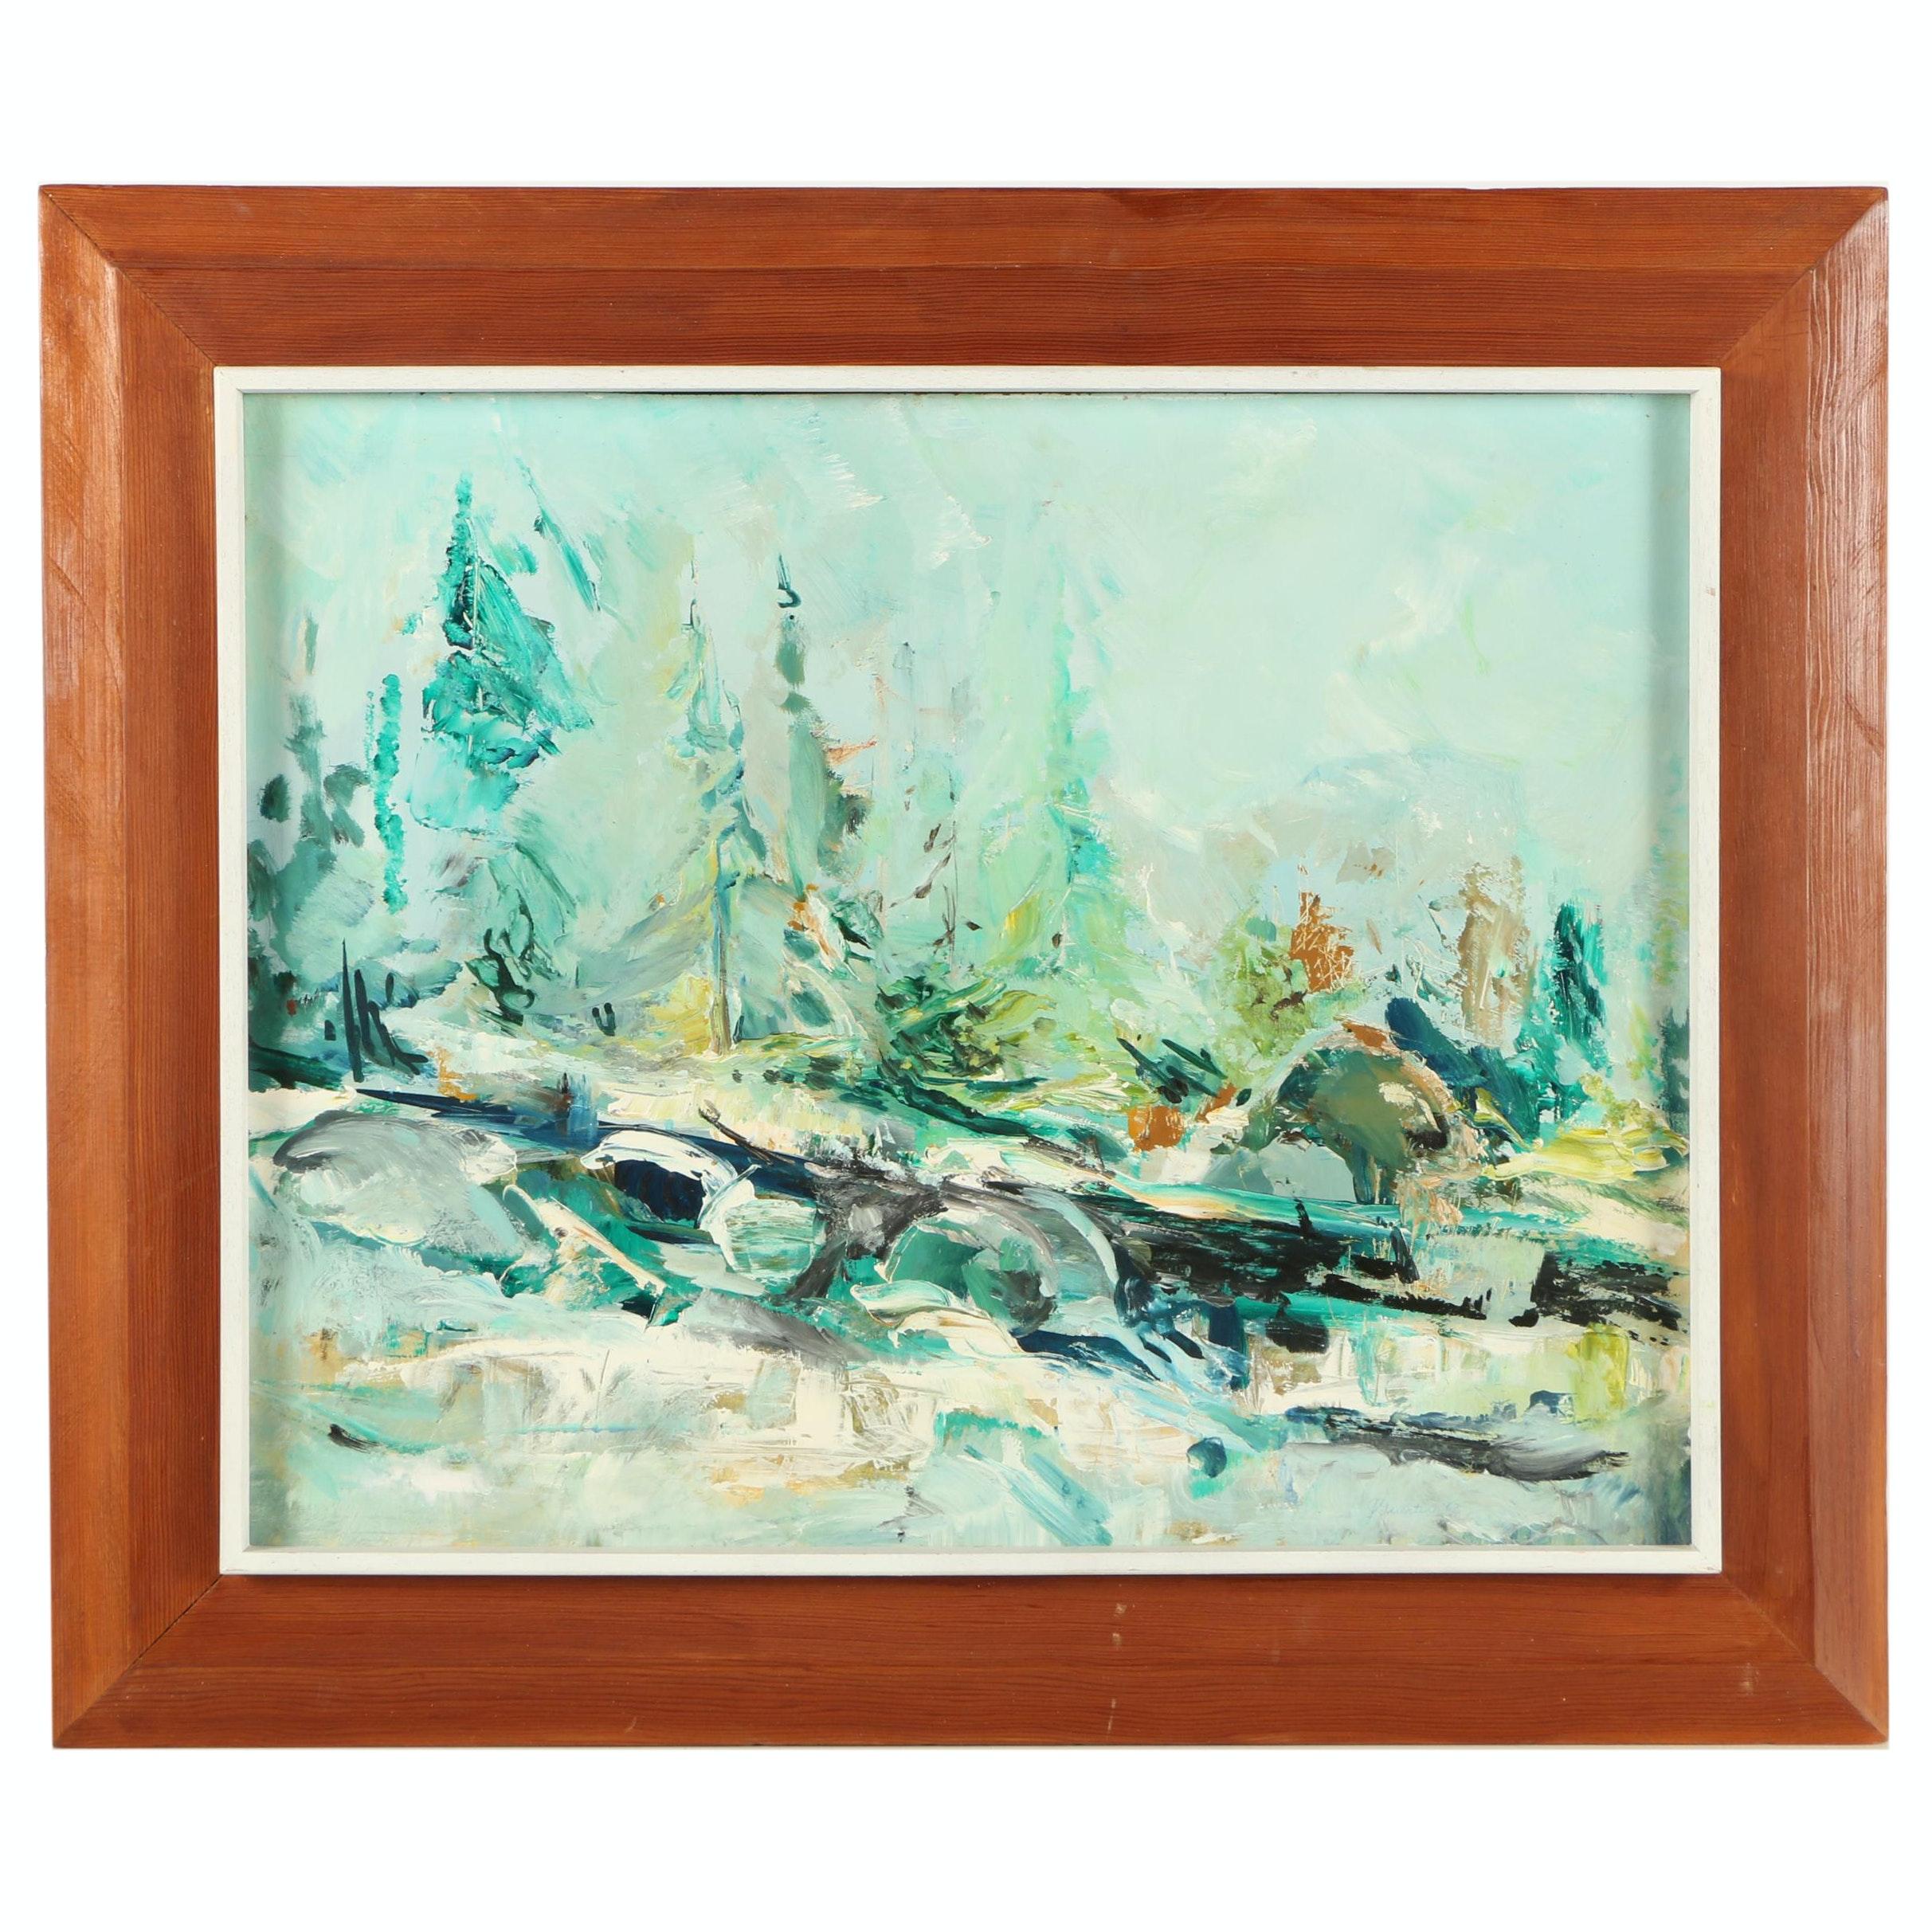 J. Guertin Landscape Oil Painting